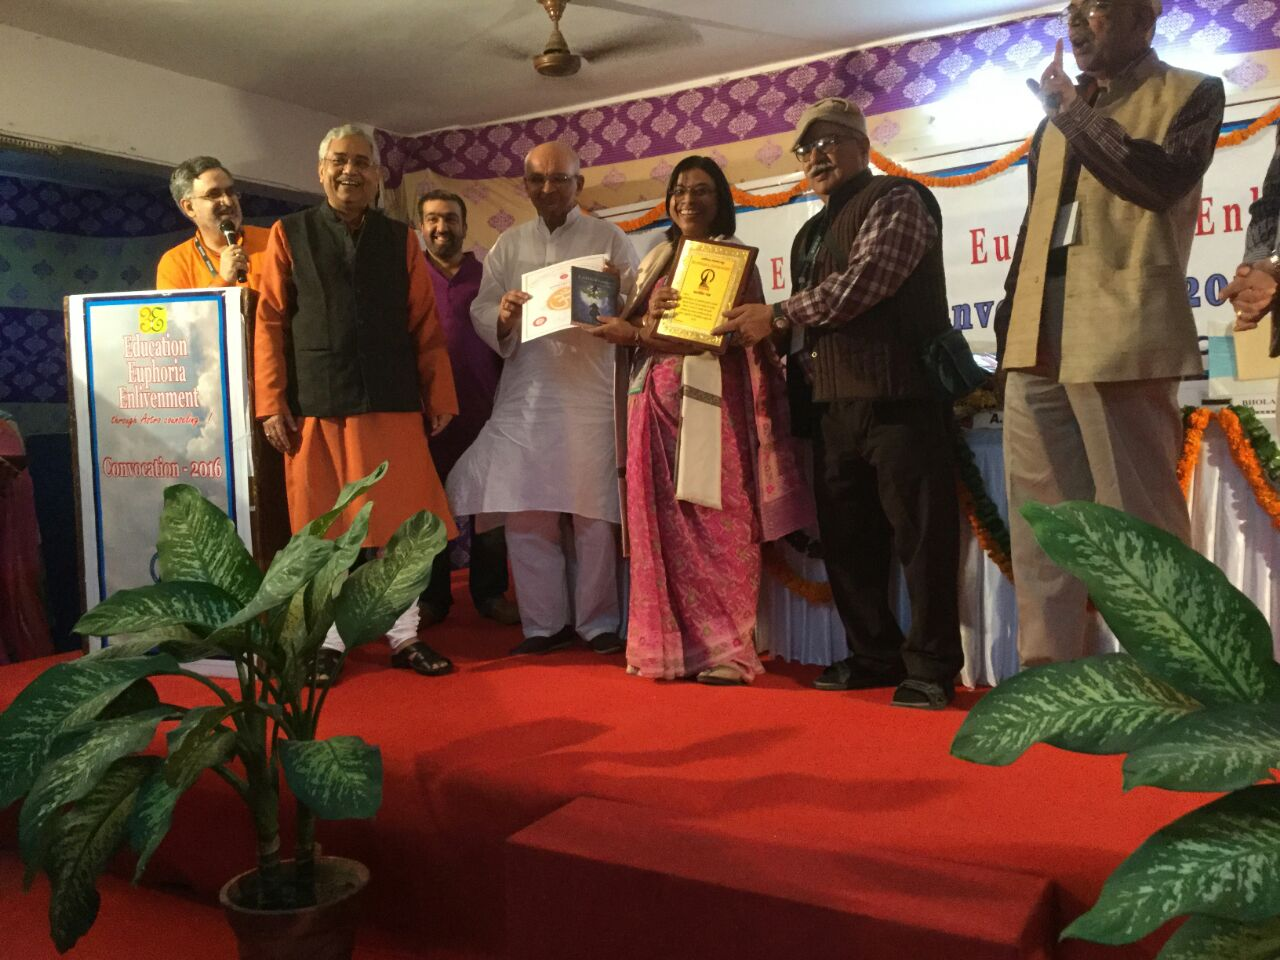 Honoring Anita Baranwal, Senior Lecturer, ICAS, Noida Chapter. Also in pic A.B. Shukla, Suresh Chandra Mishra, M. N Kedar, Bhola Nath Shukla, Ashish Sharma, Pradeep Chaturvedi.